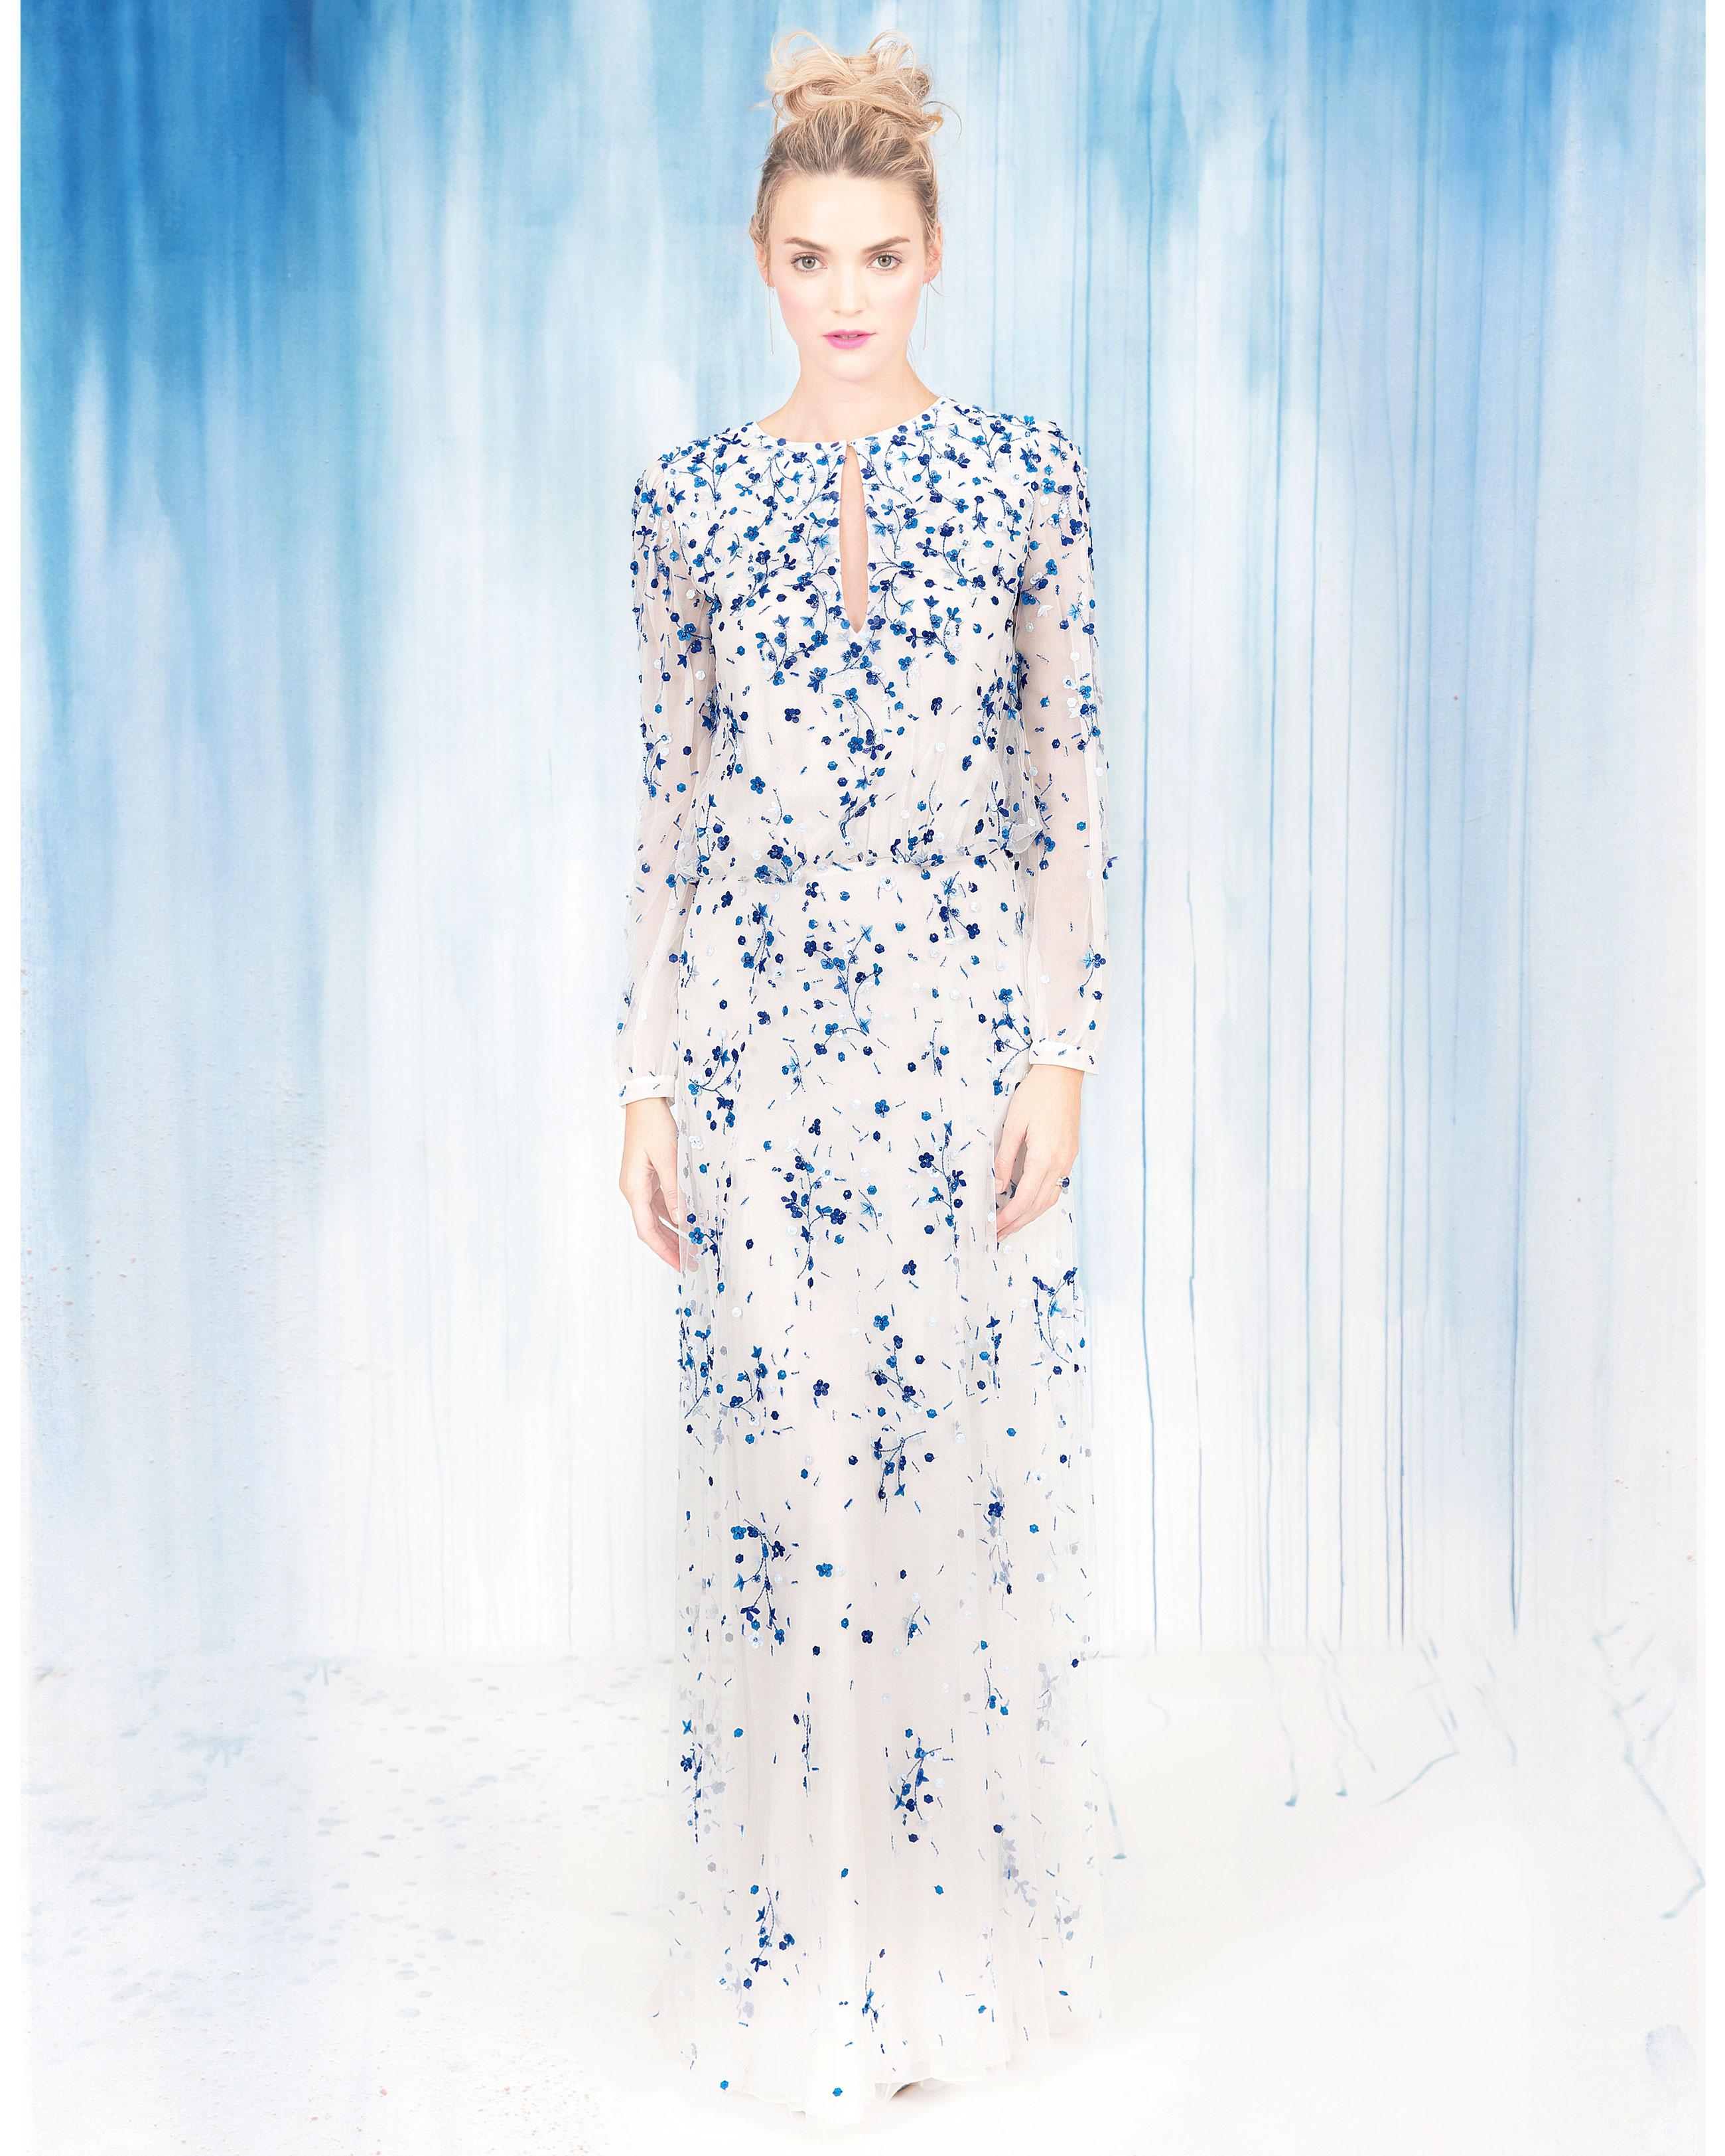 mmonique-long-sleeve-blue-detail-dress-50-d112700.jpg